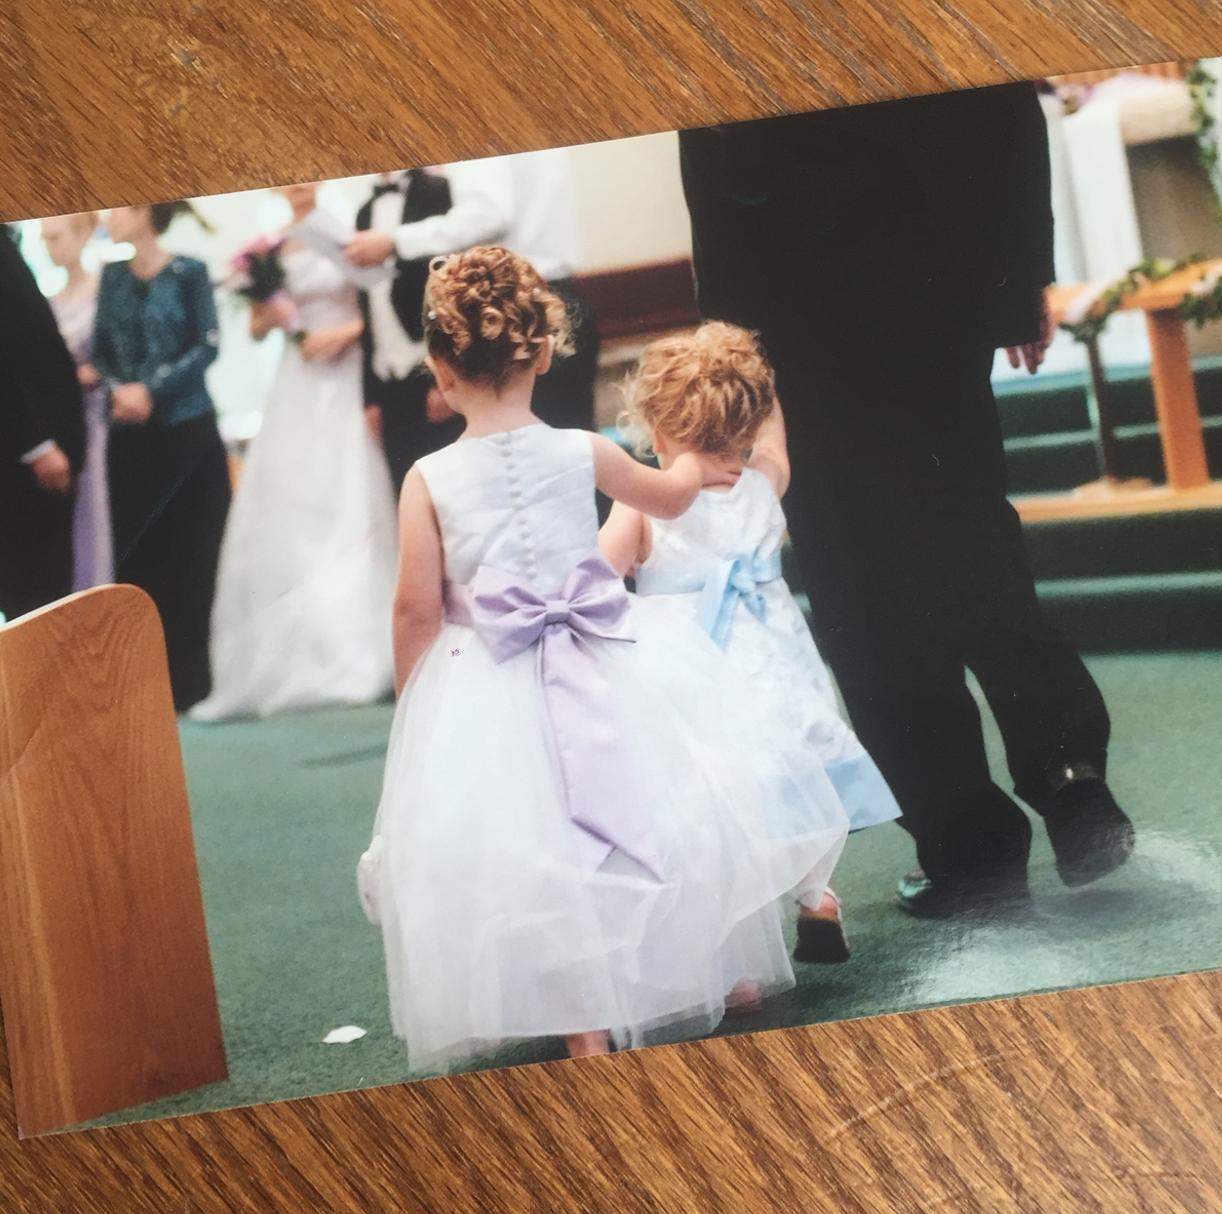 old wedding photo for Legacybox